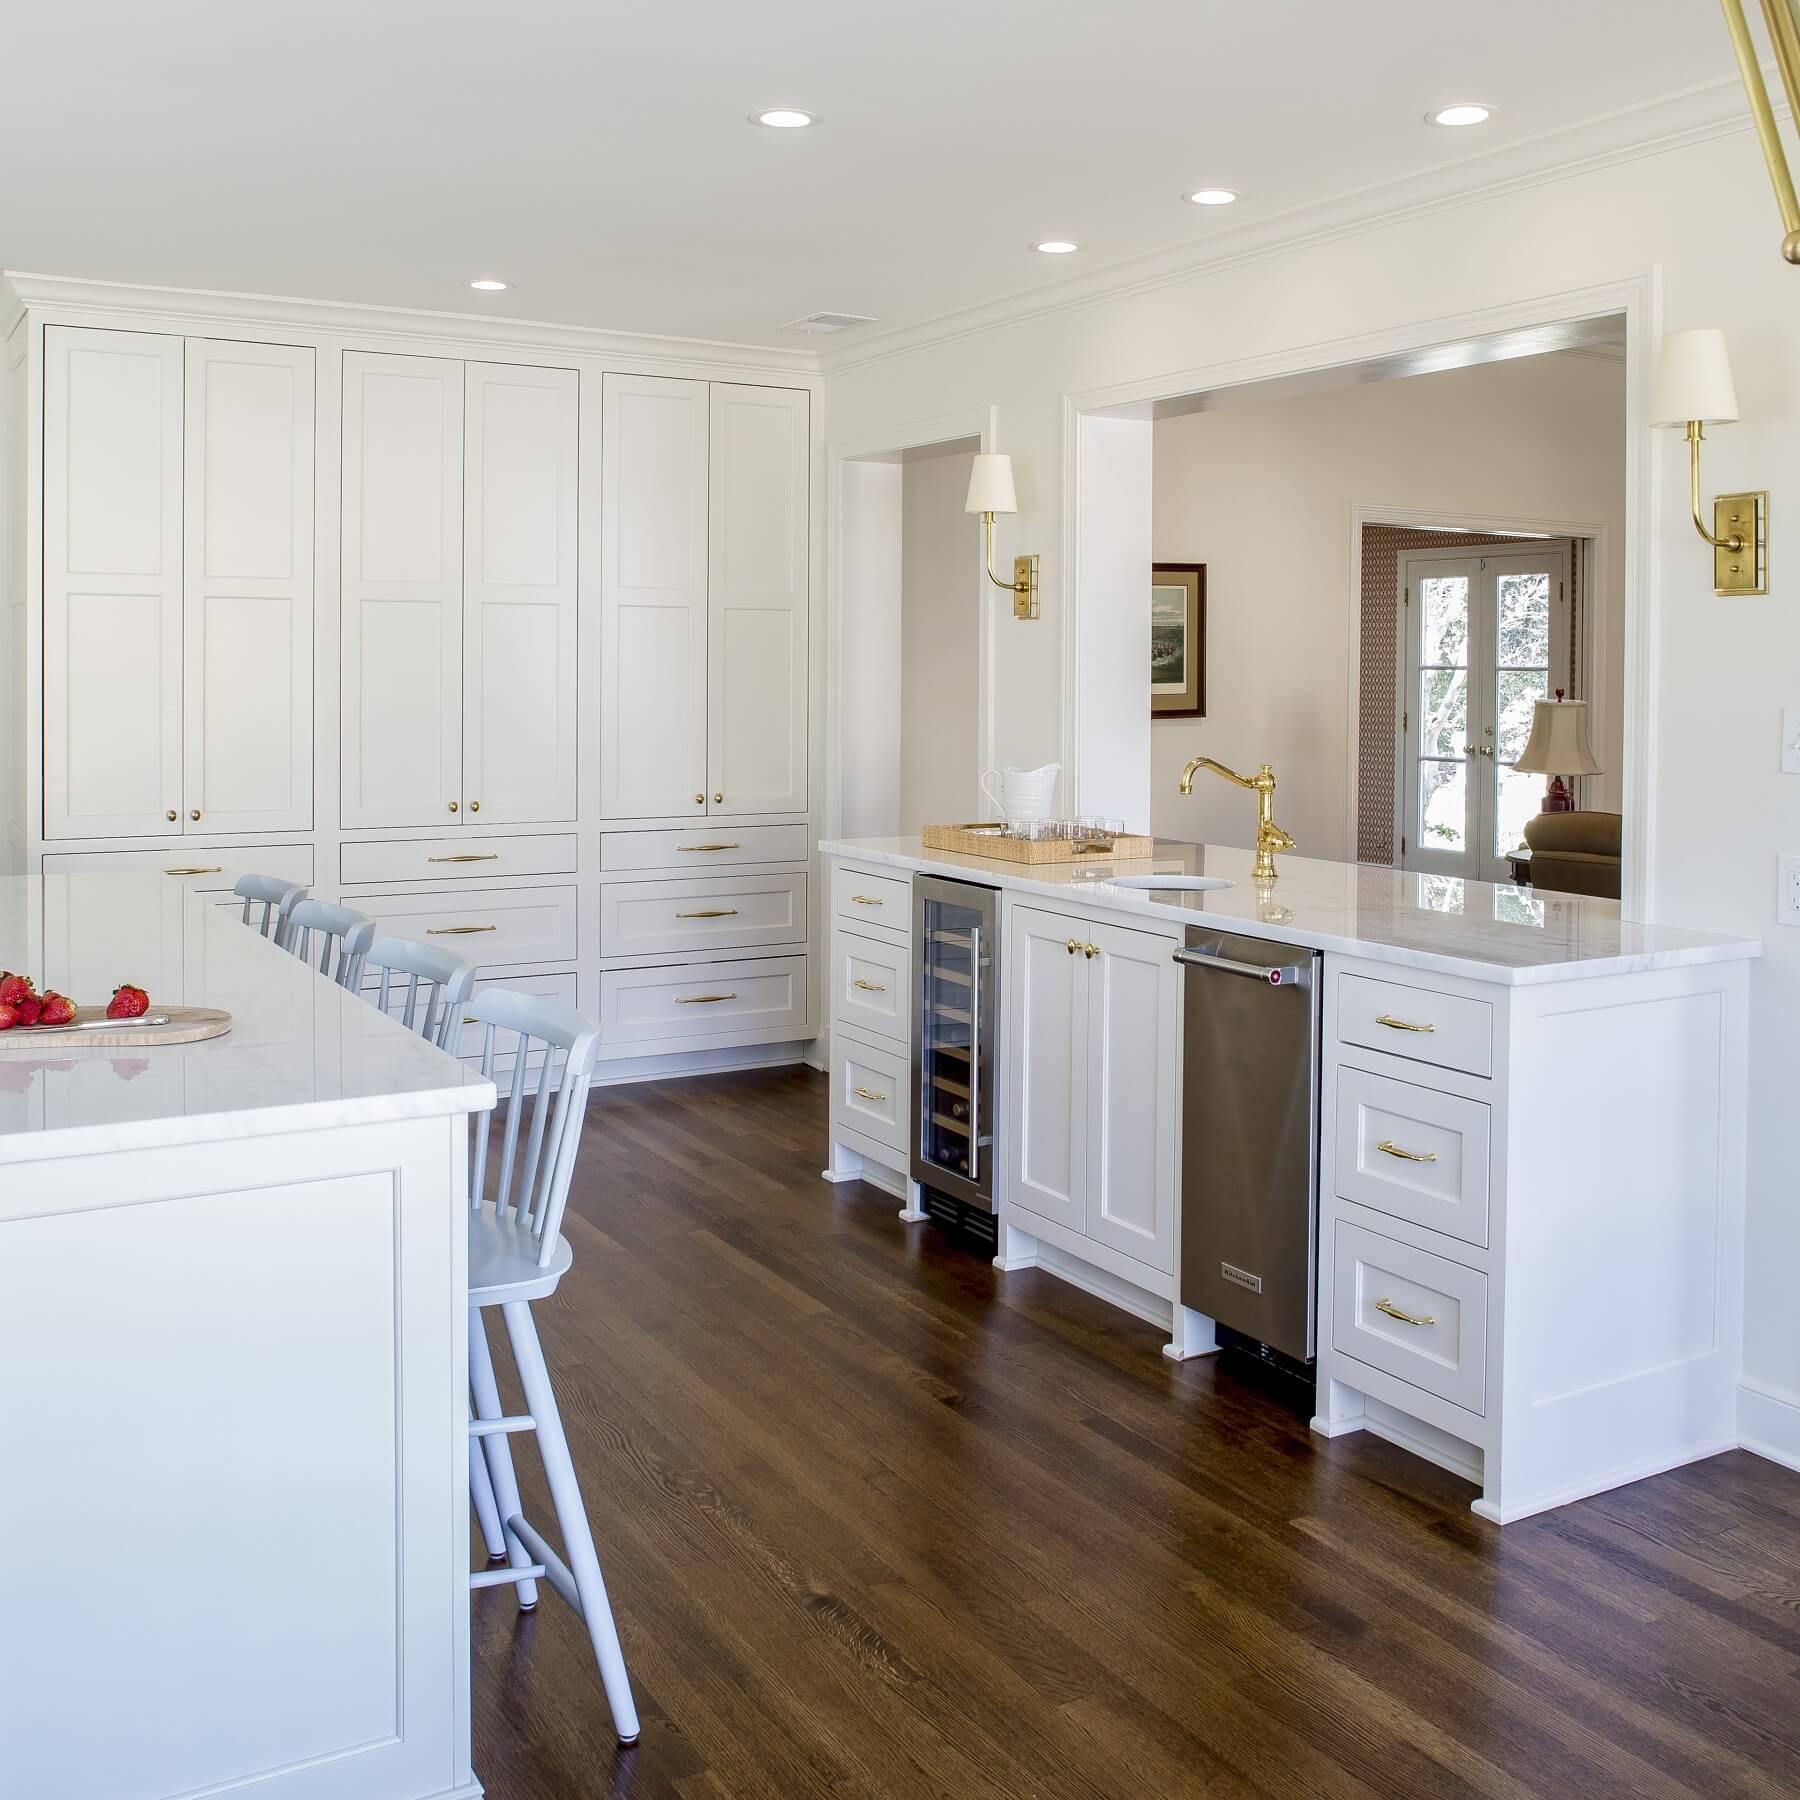 We are loving this bright, white kitchen!